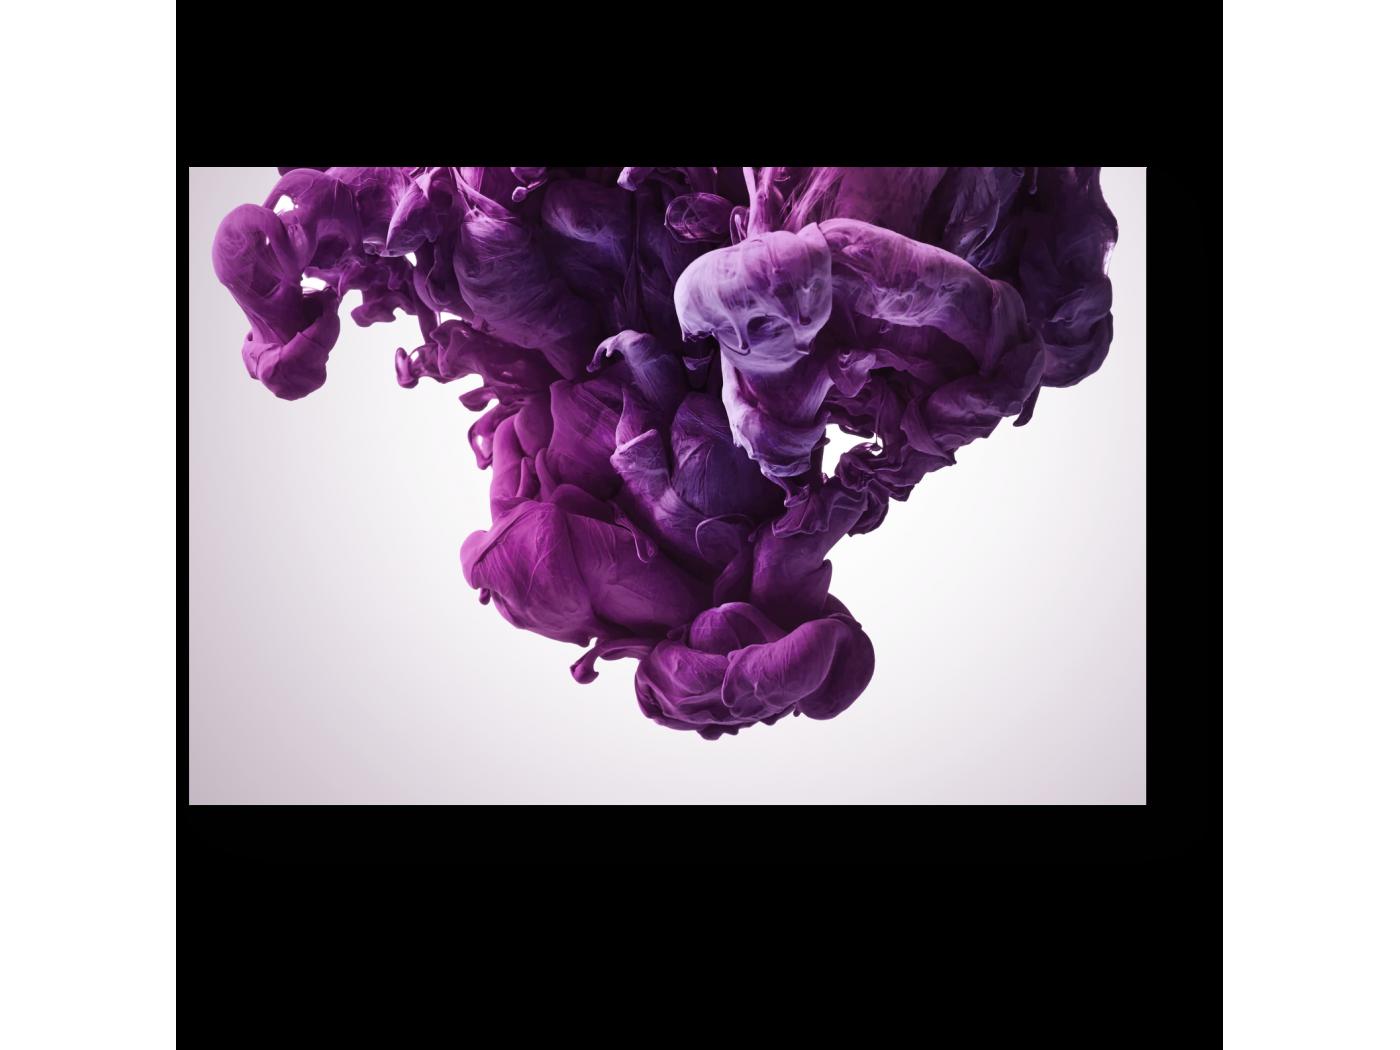 Модульная картина Сиреневая феерия (30x20) фото